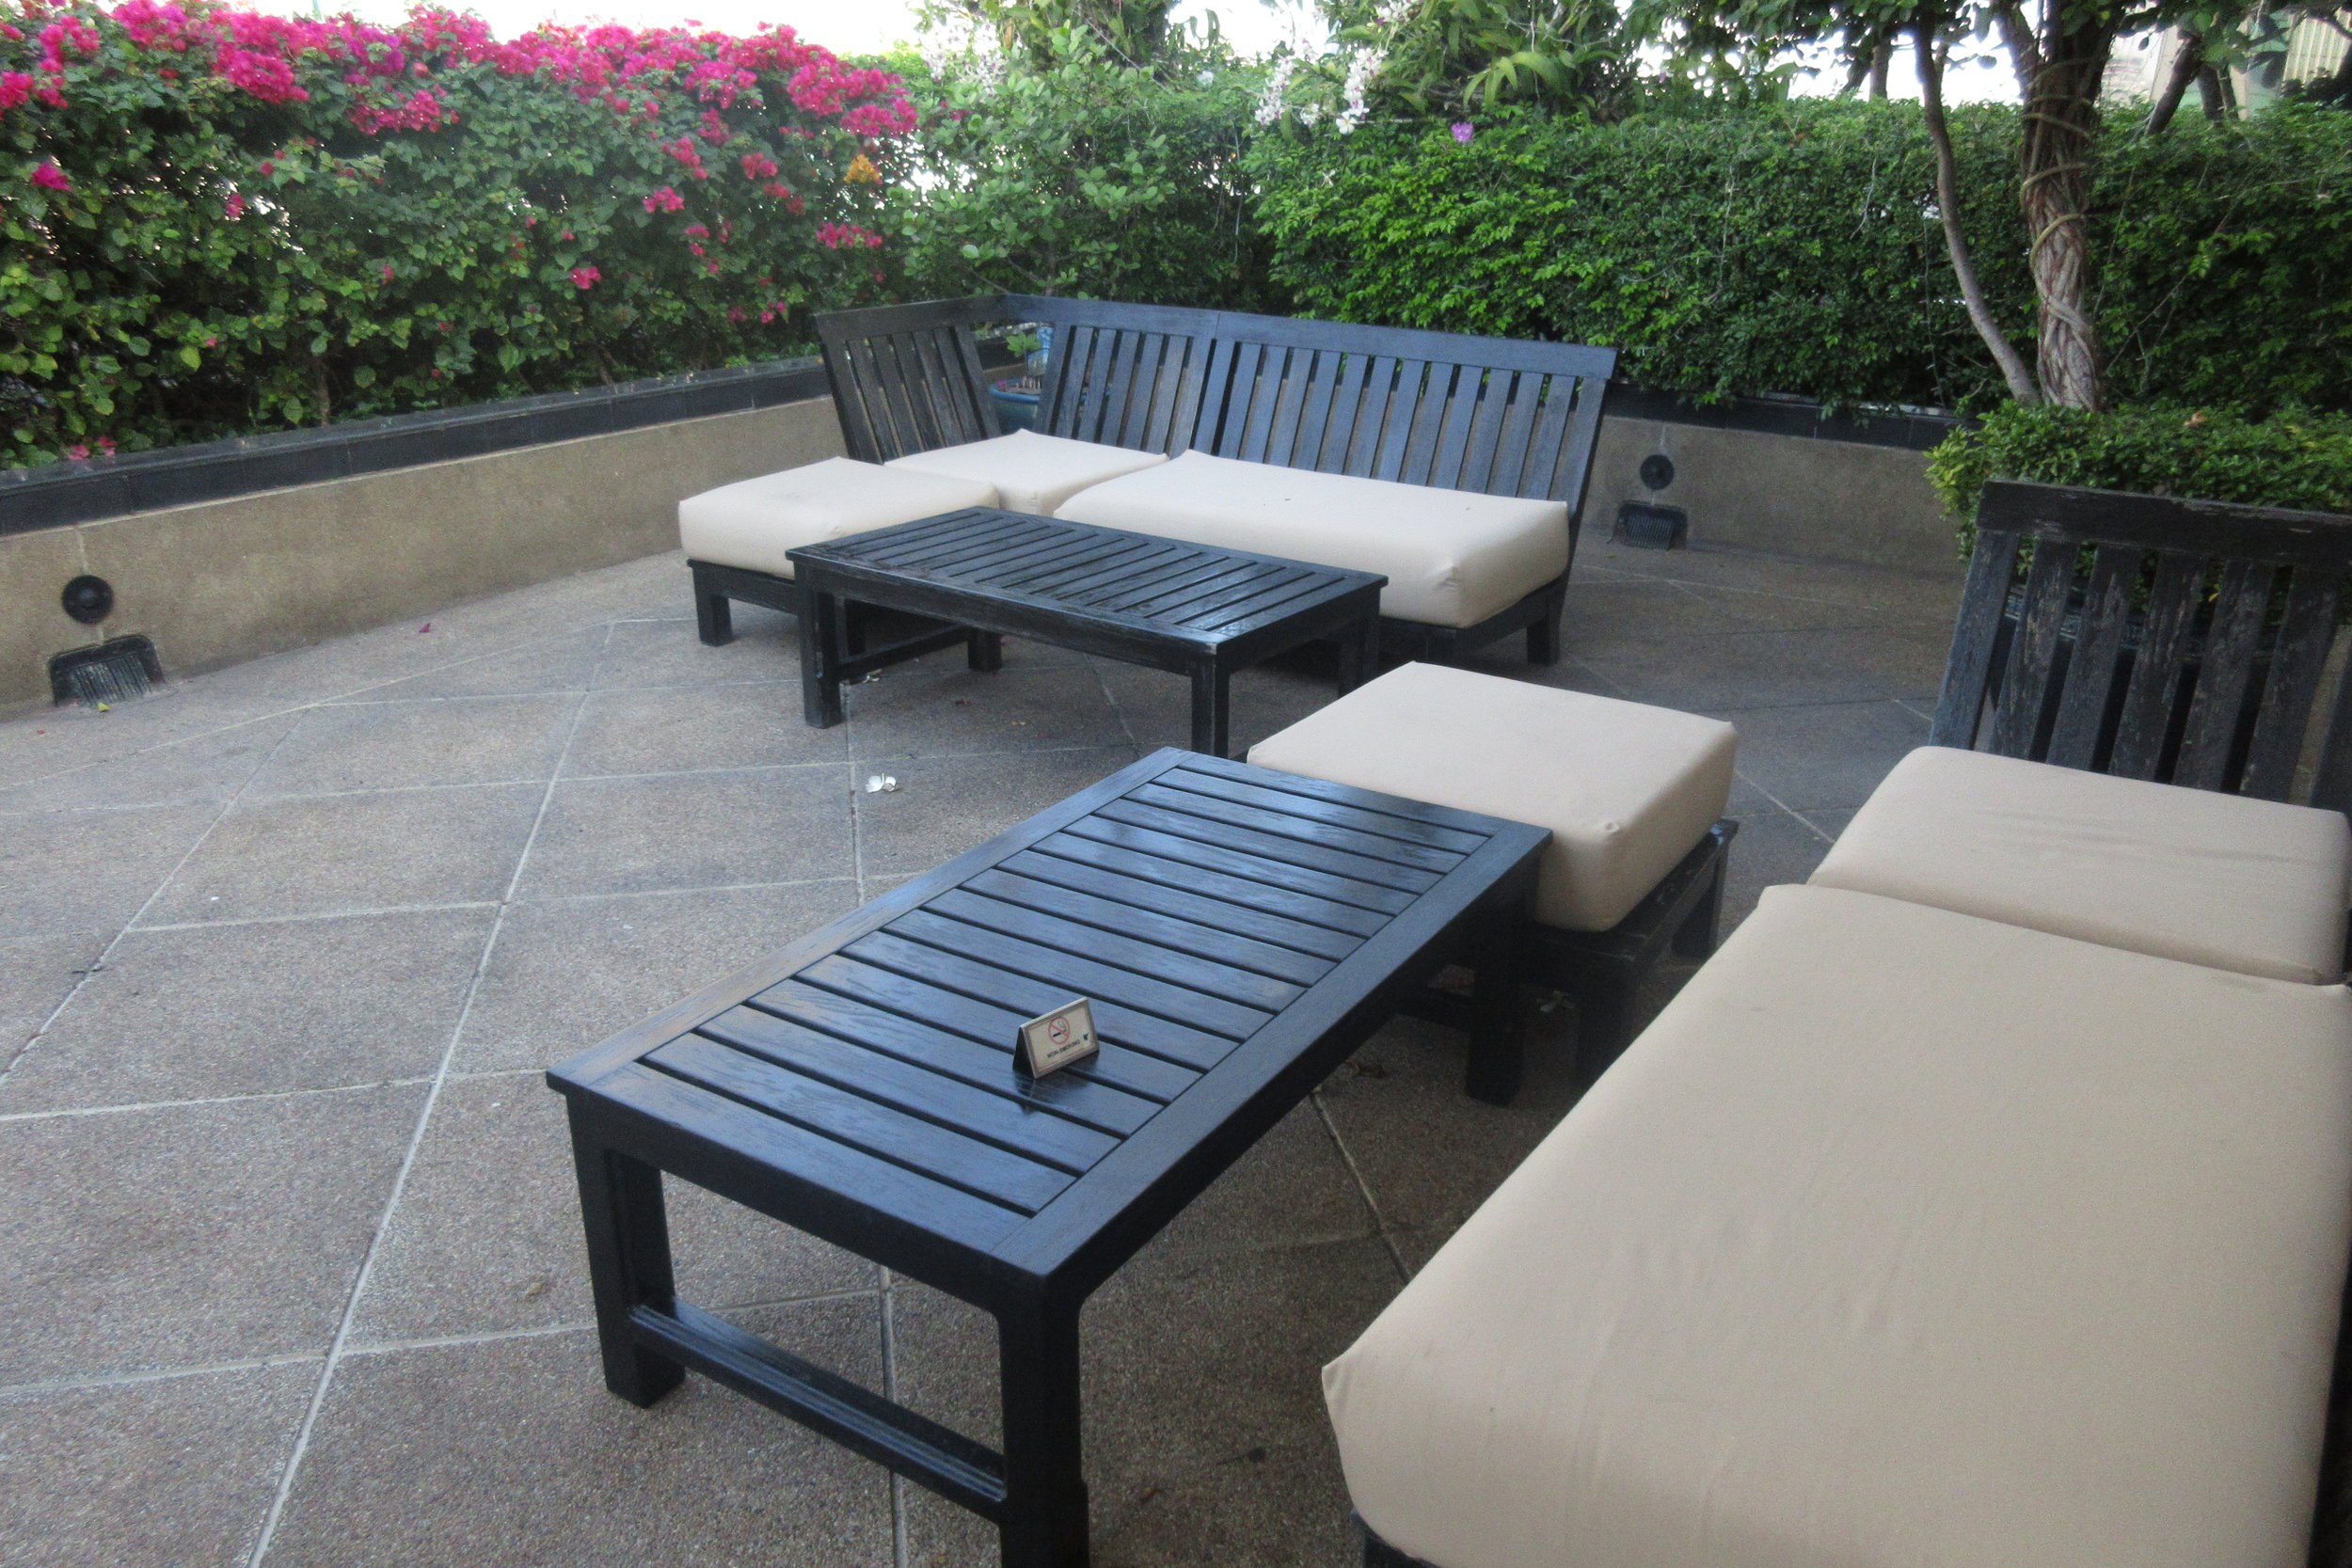 JW Marriott Bangkok – Club Lounge rooftop patio